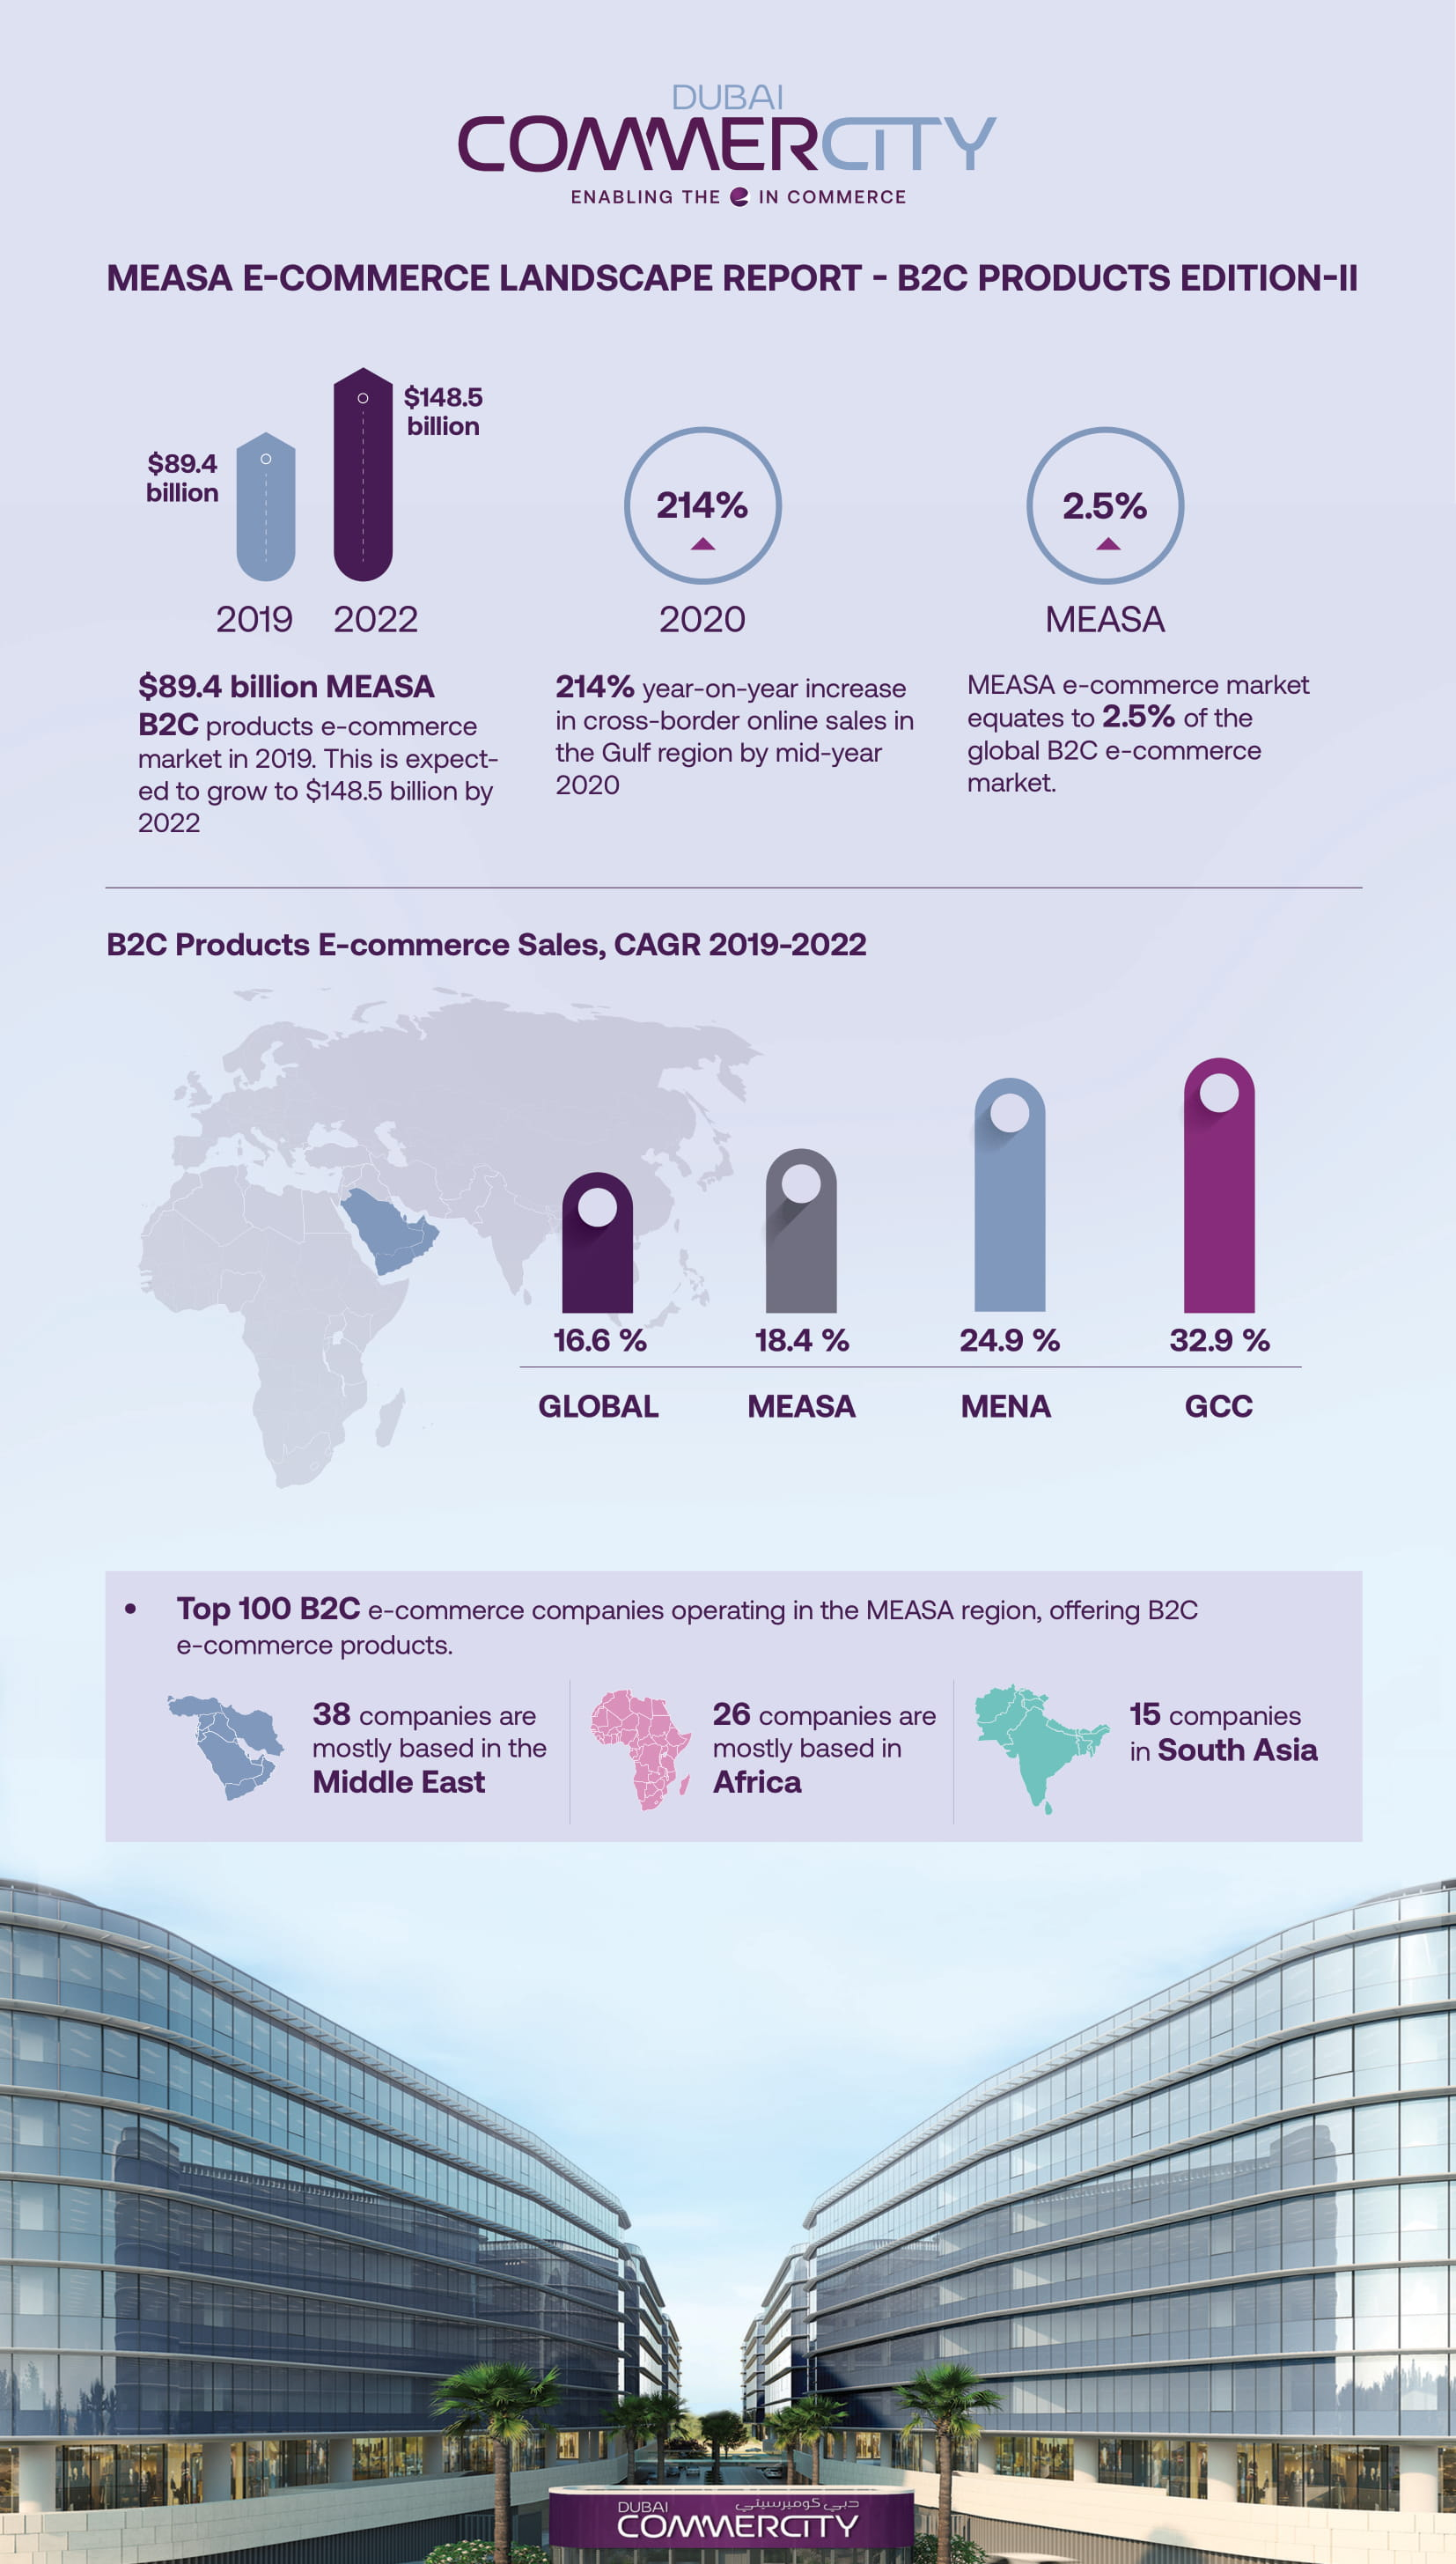 dcc measa e-commerce 2022